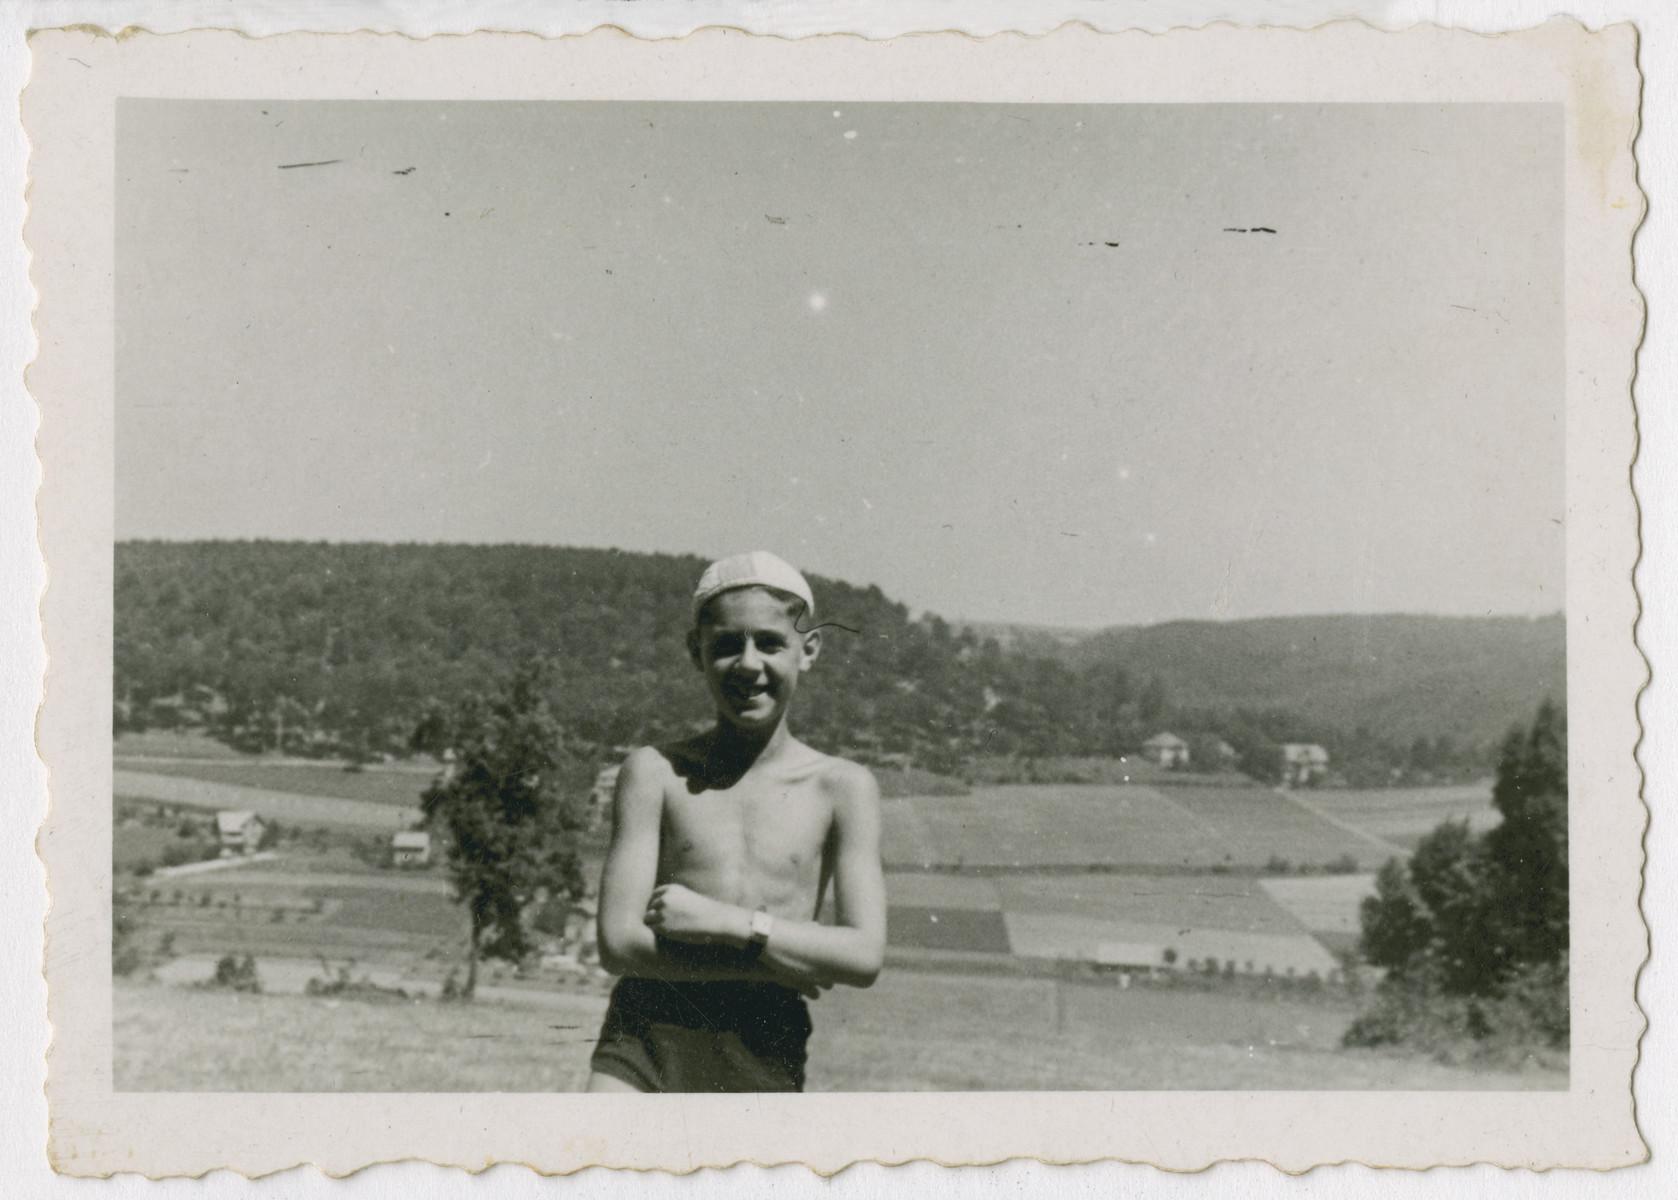 Marian Kwasniewski enjoys the countryside after the war.